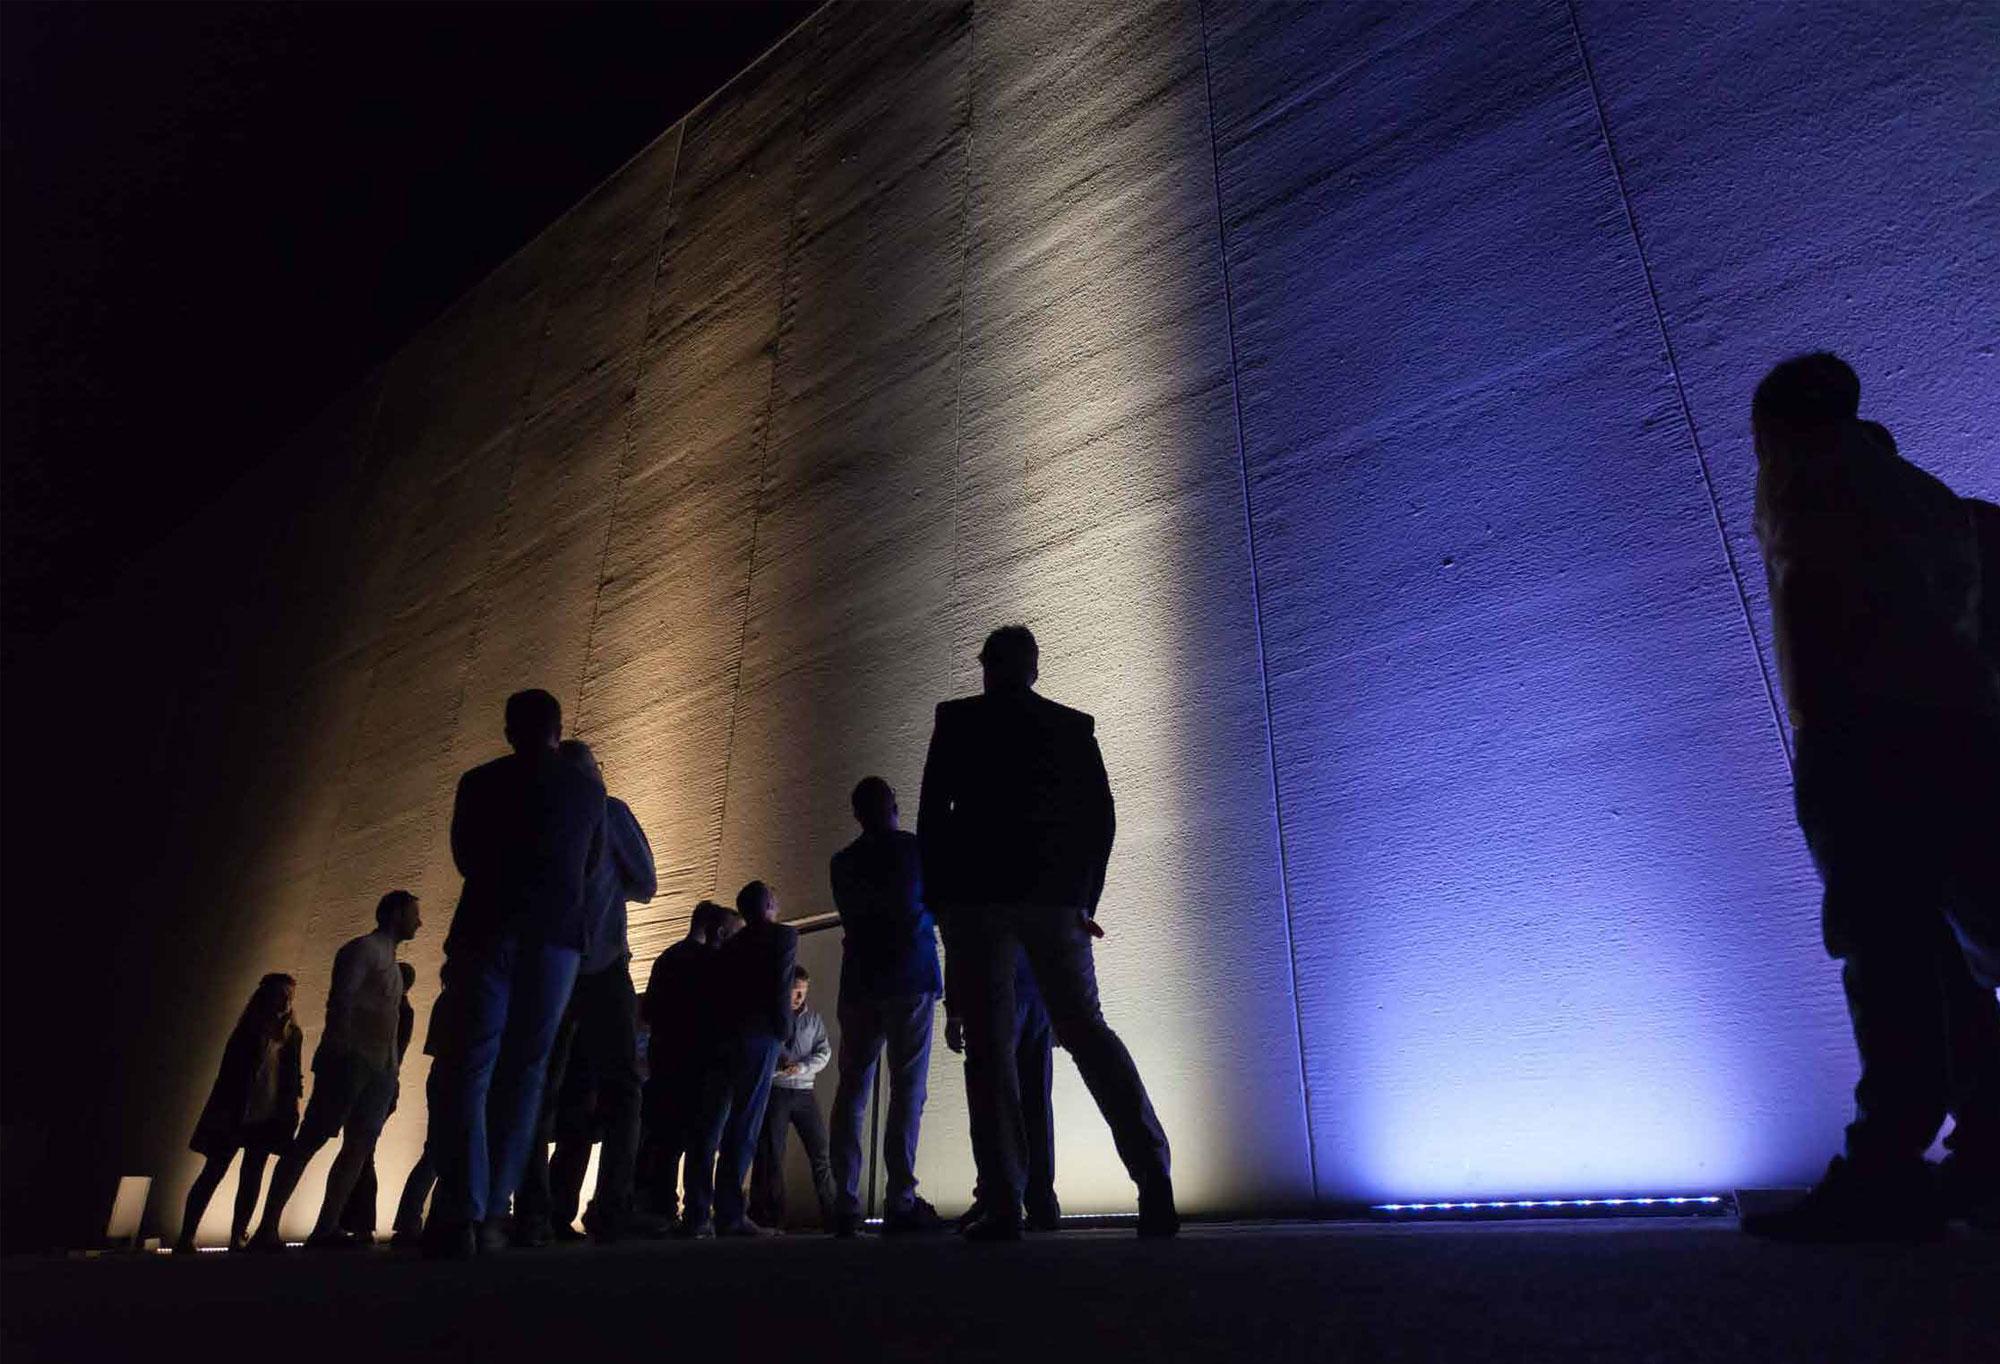 Illuminazione Esterna Iguzzini : Iguzzini lighting innovation for people